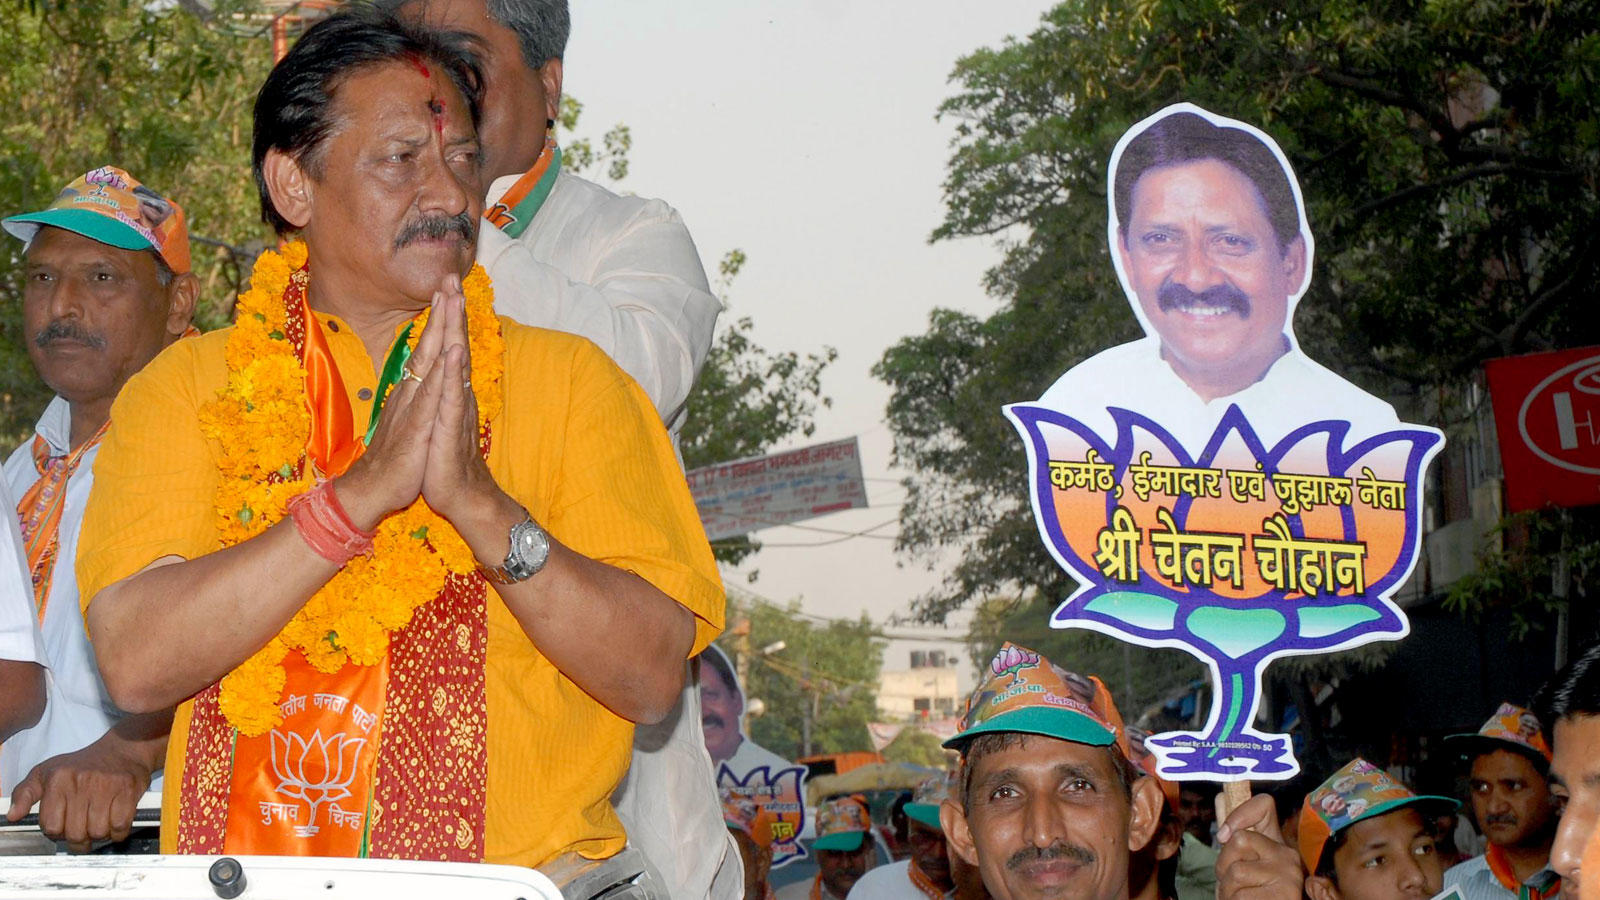 Chetan Chauhan, a two-time BJP MP